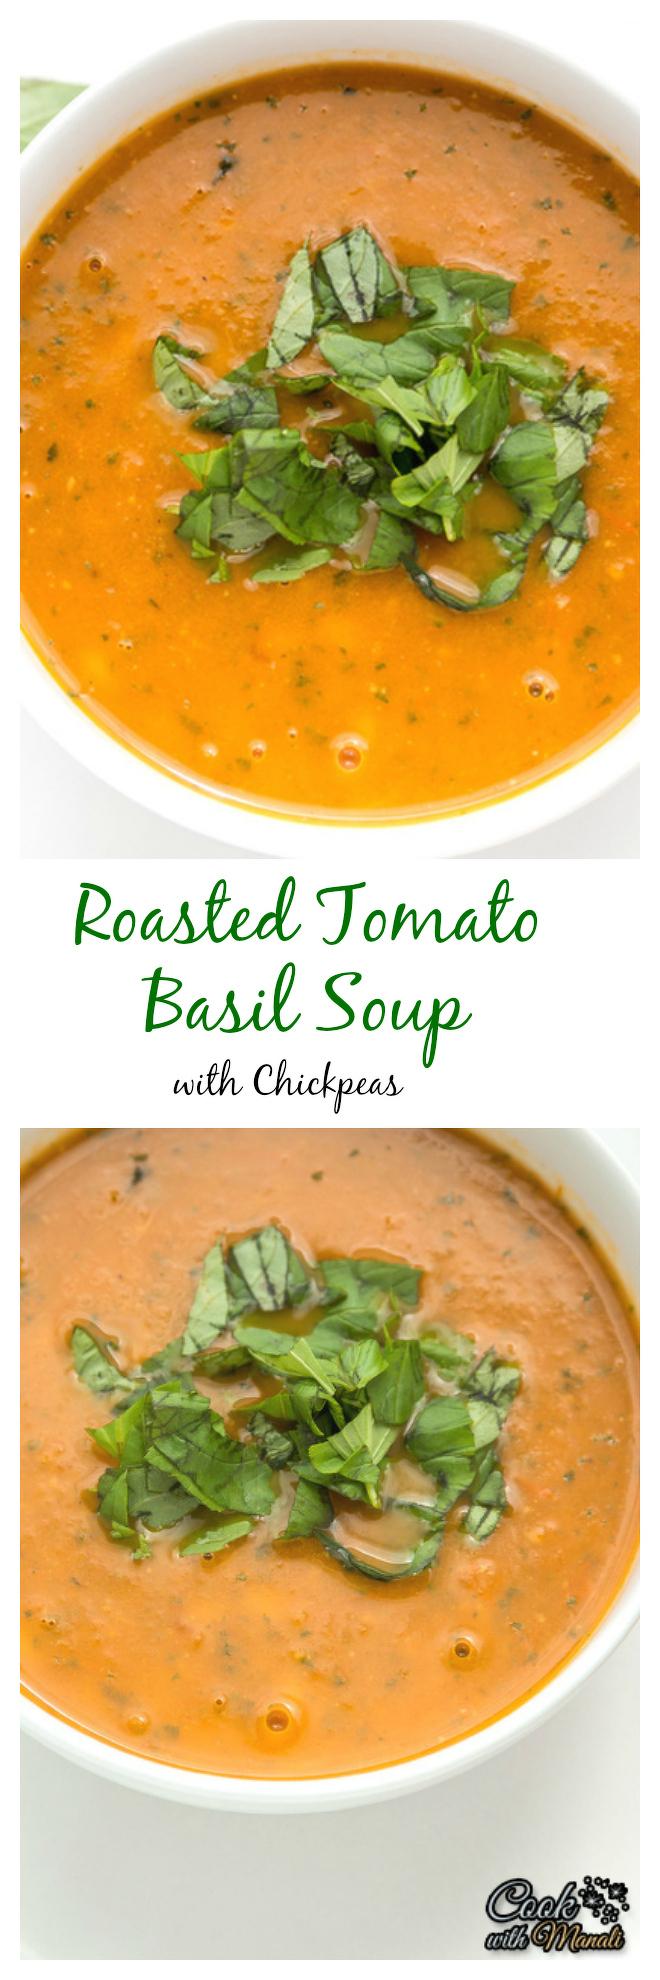 Basil-Tomato-Chickpeas-Soup-Collage-nocwm